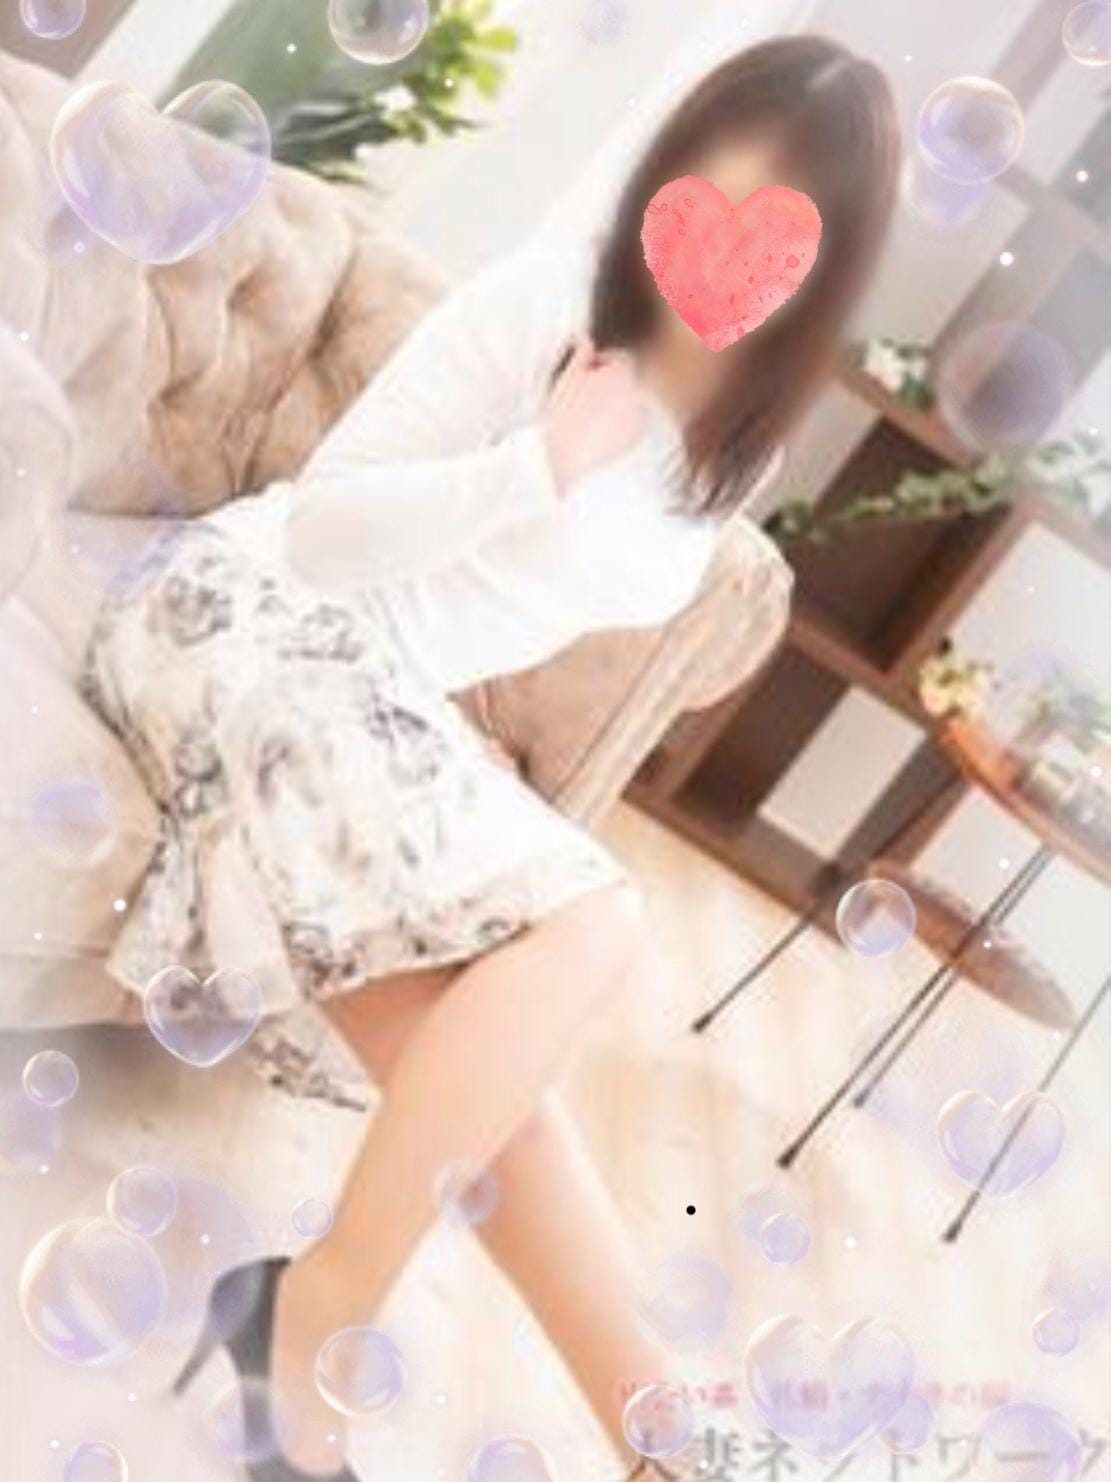 https://s3-ap-northeast-1.amazonaws.com/files.fuzoku.jp/img/shop/deaituma/diary/45384407/d_0_20190306141101963.jpeg